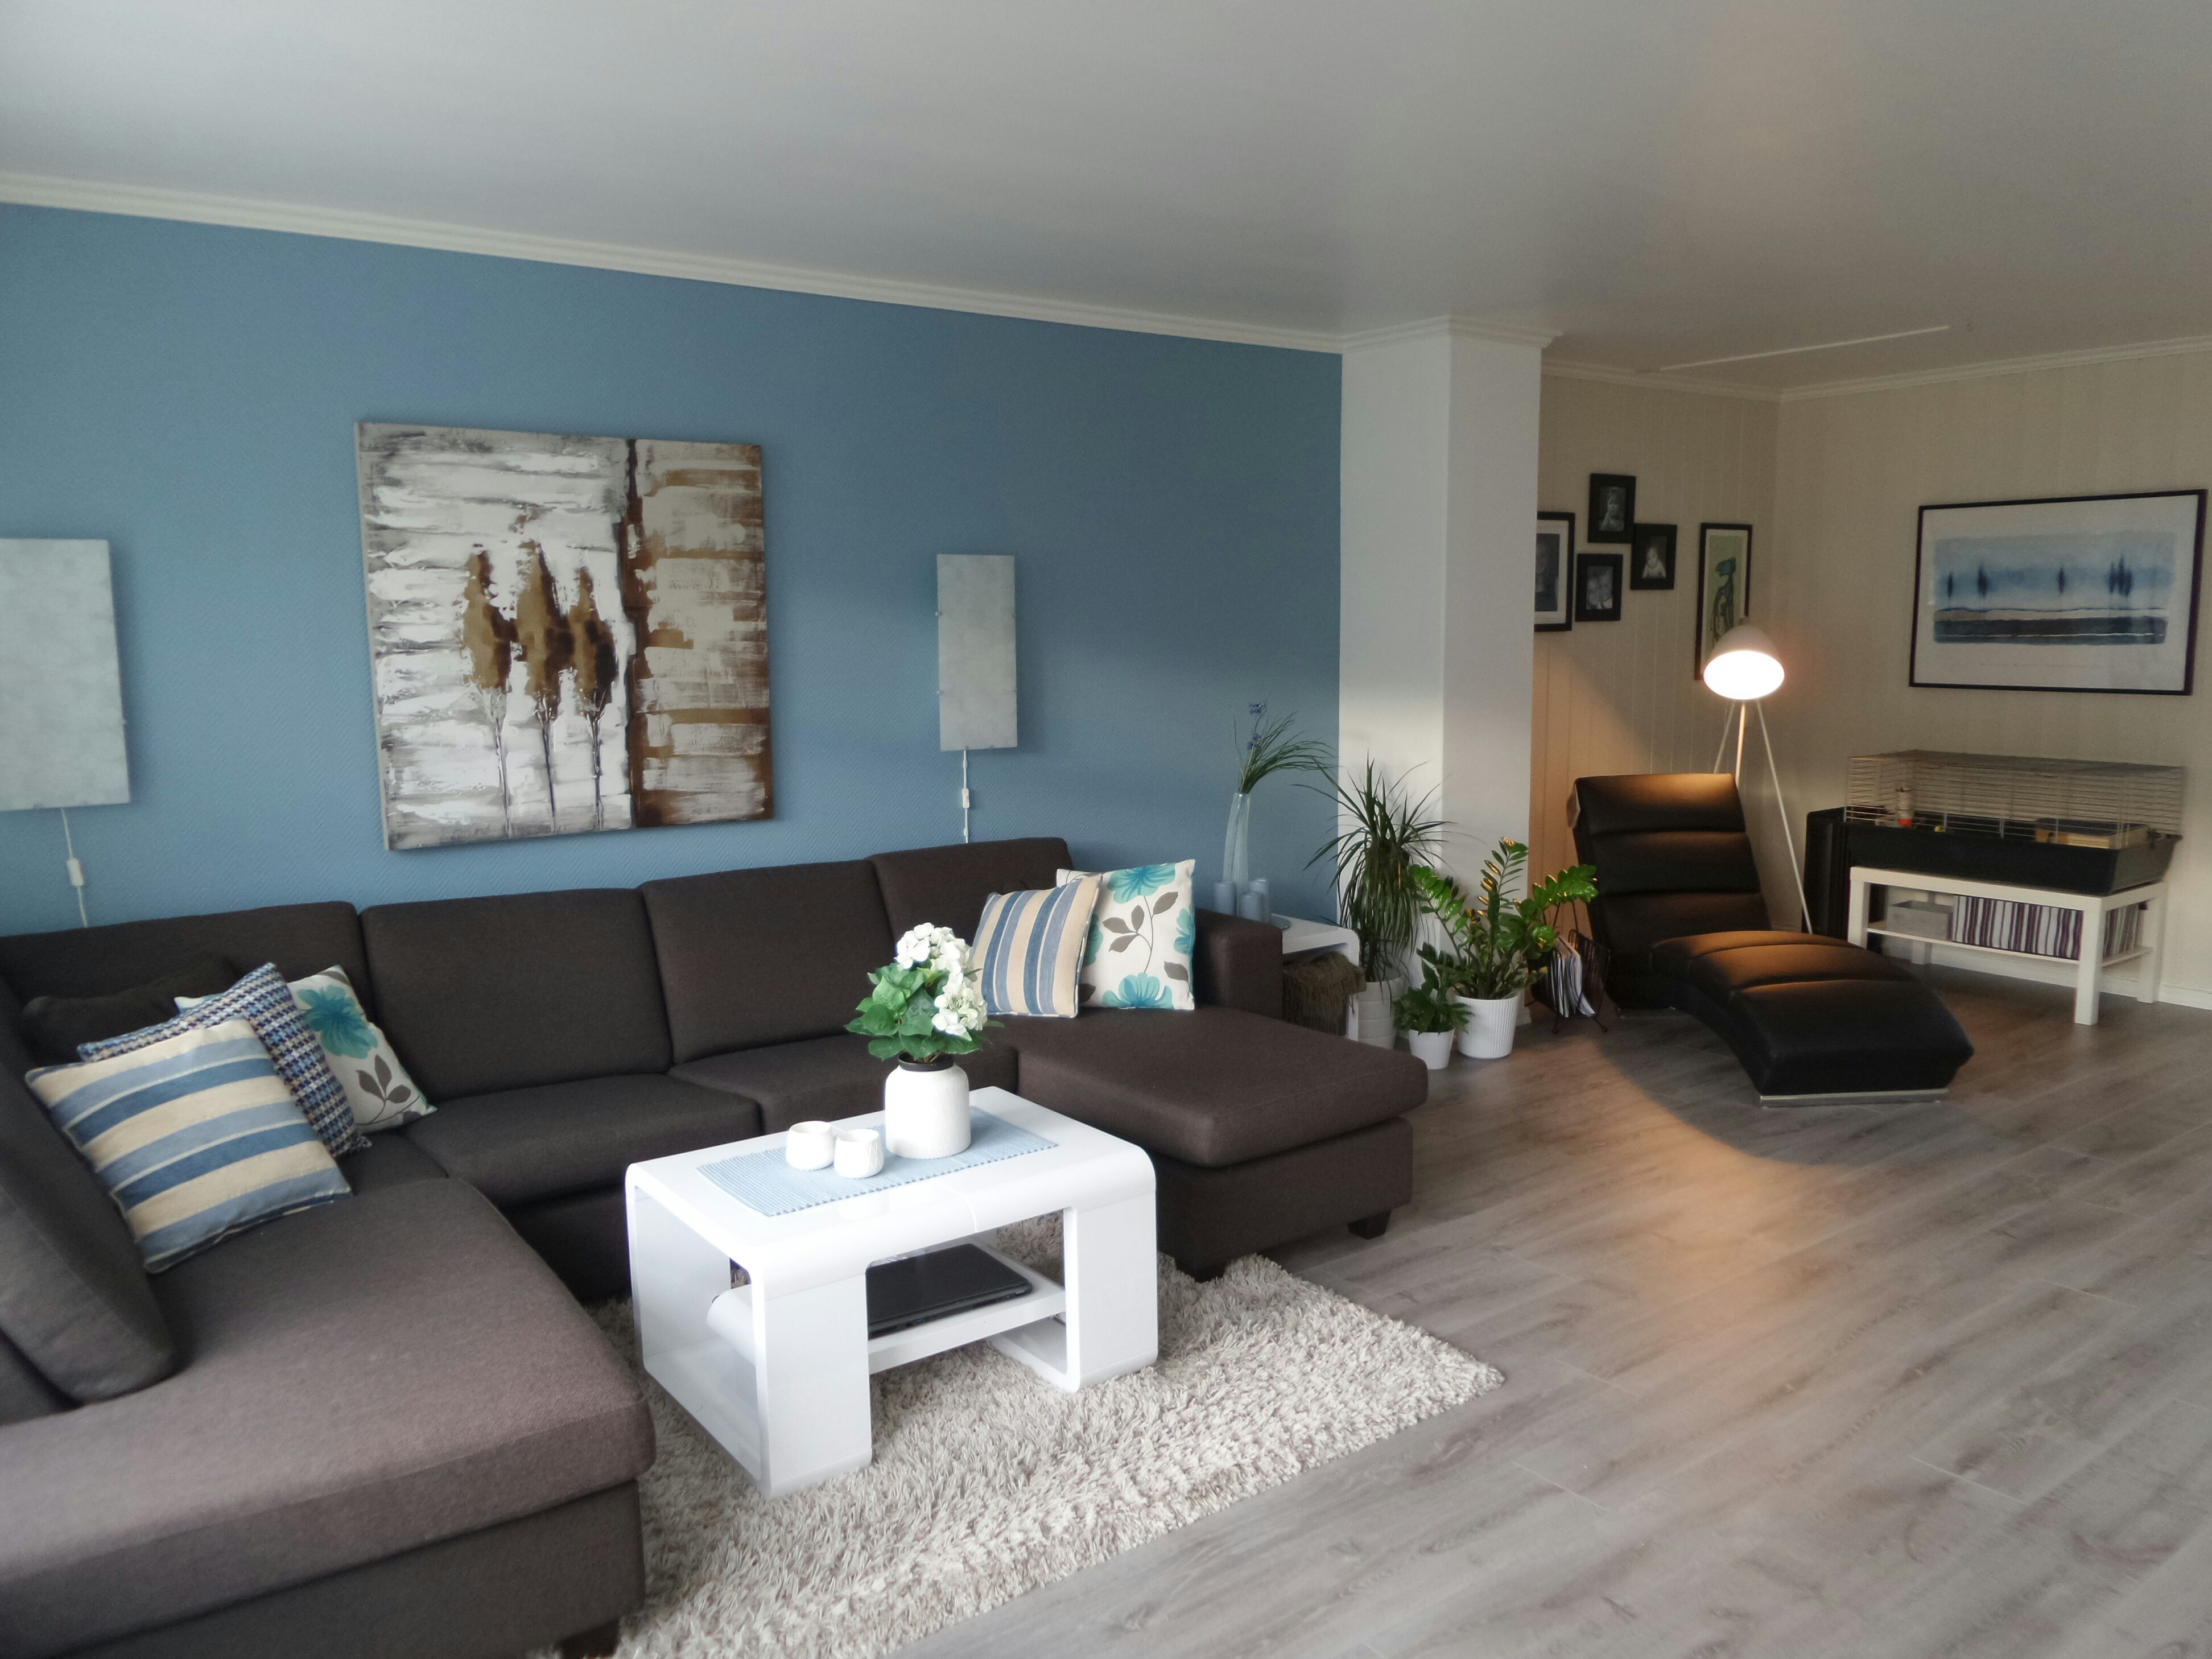 living room ideas grey floor in 2020 living room grey on floor and decor id=52989